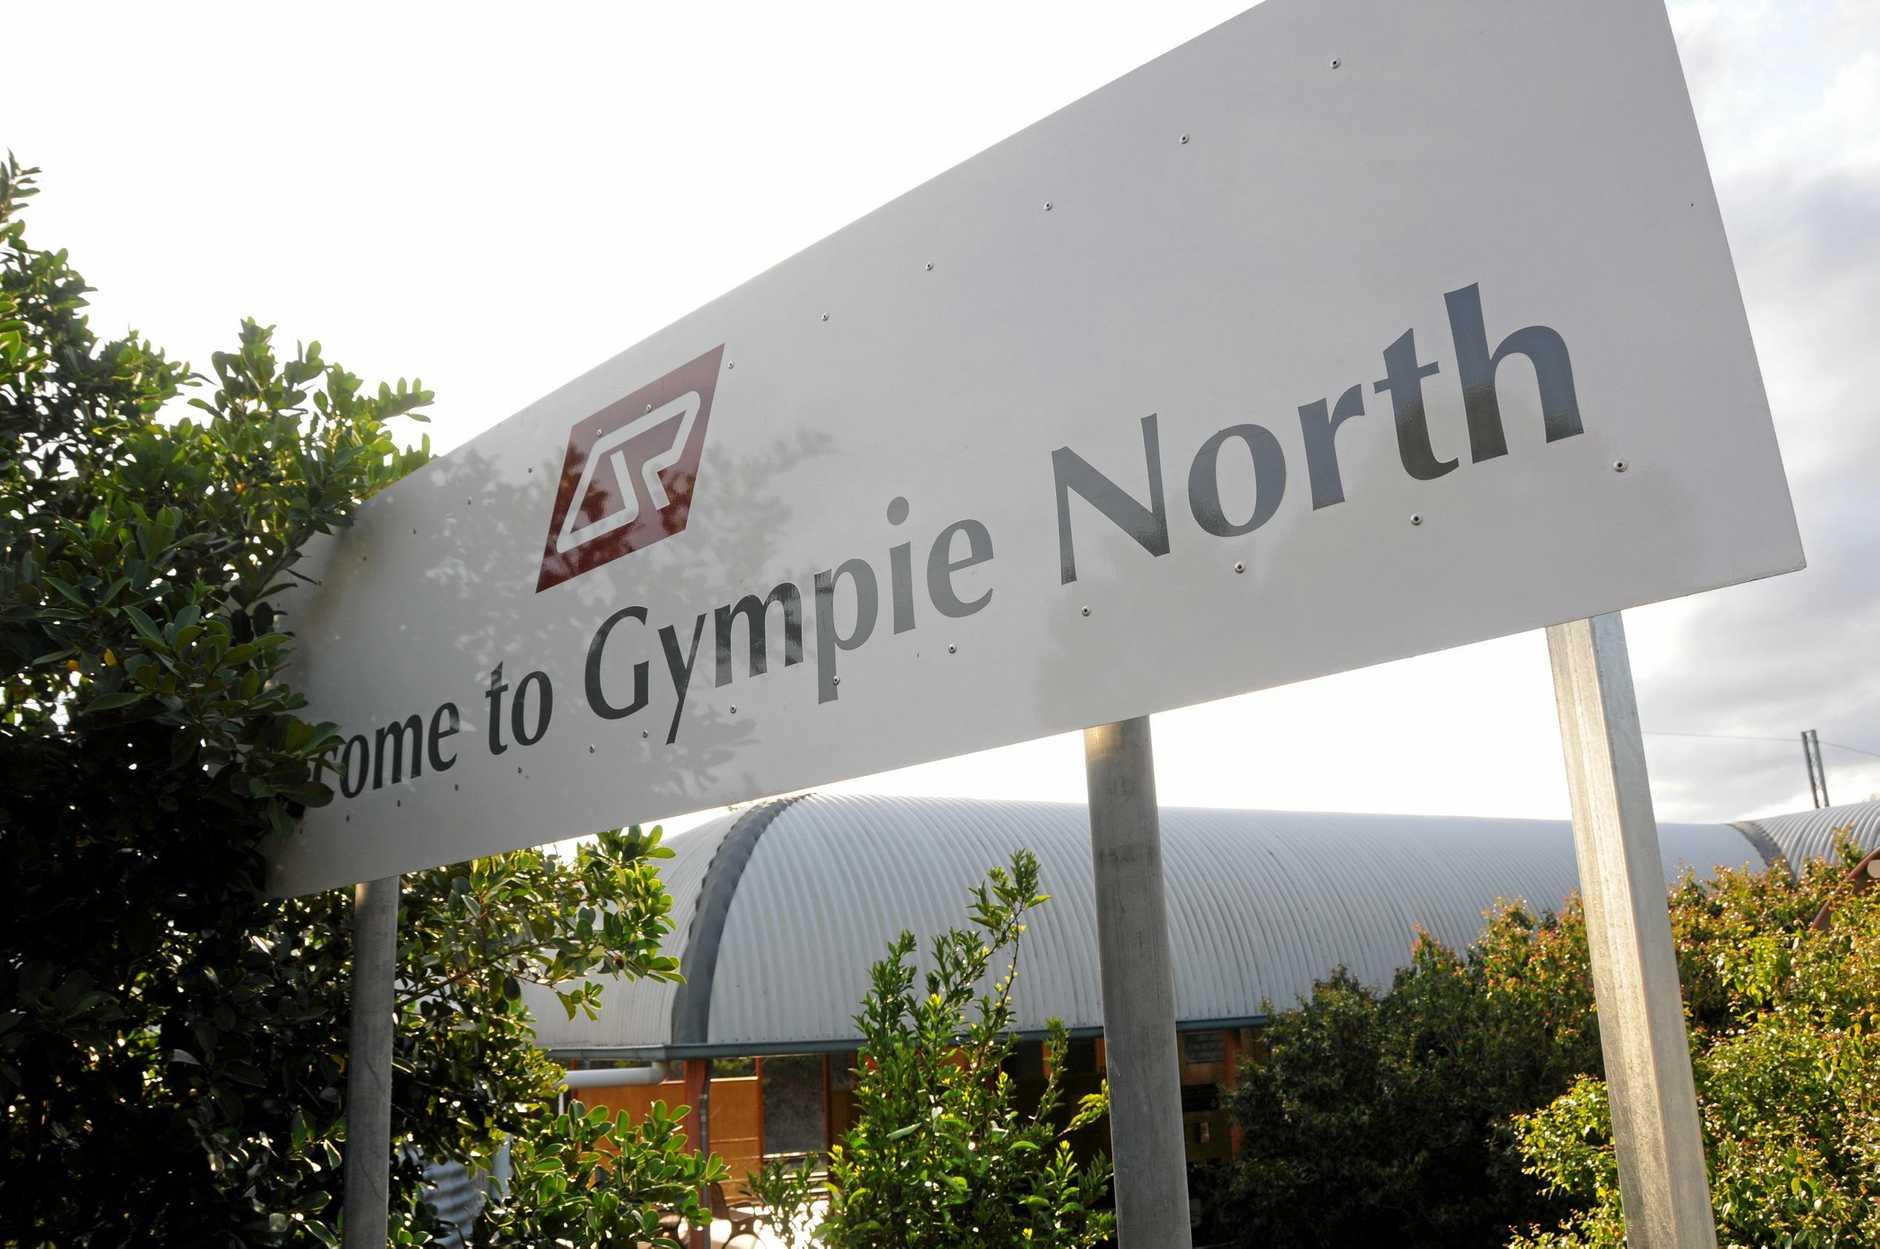 Gympie North Railway station